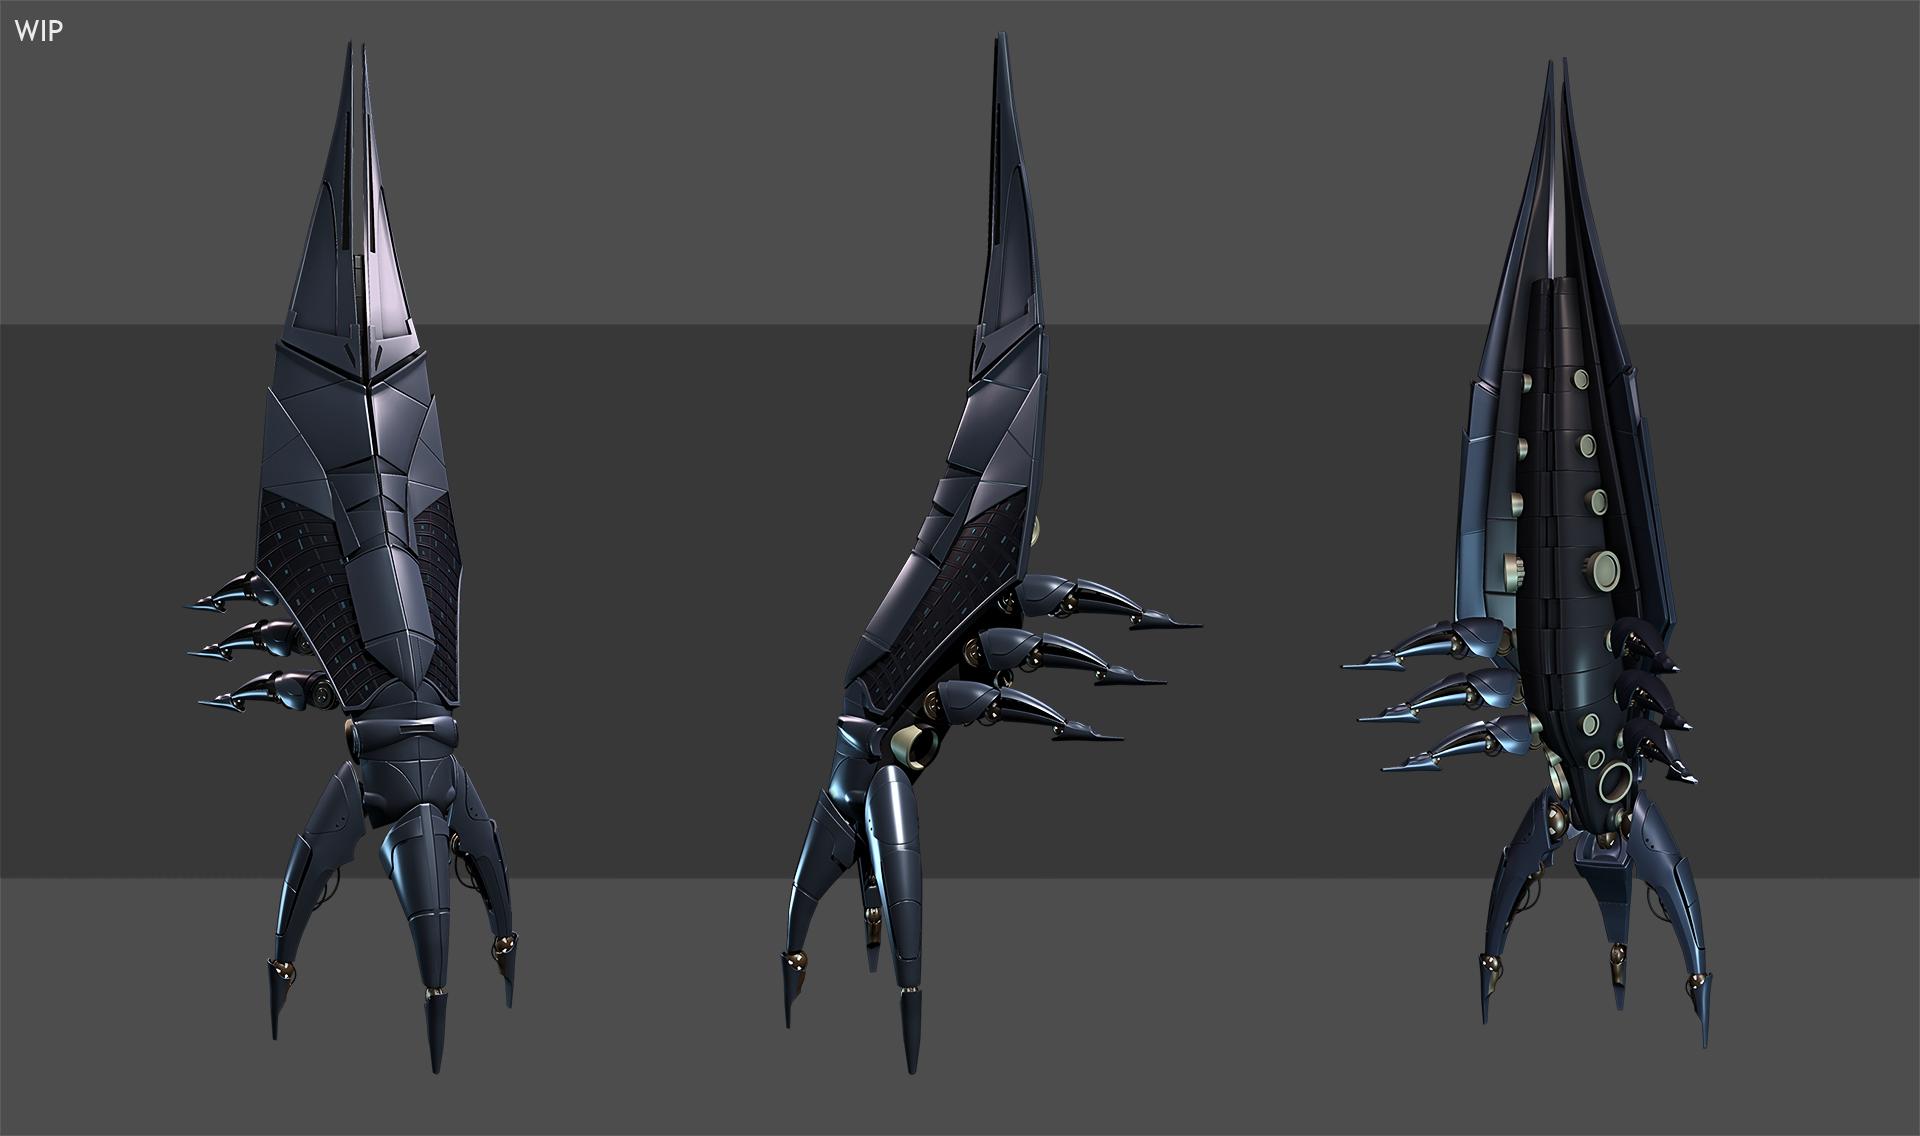 ReaperProgress_07.png